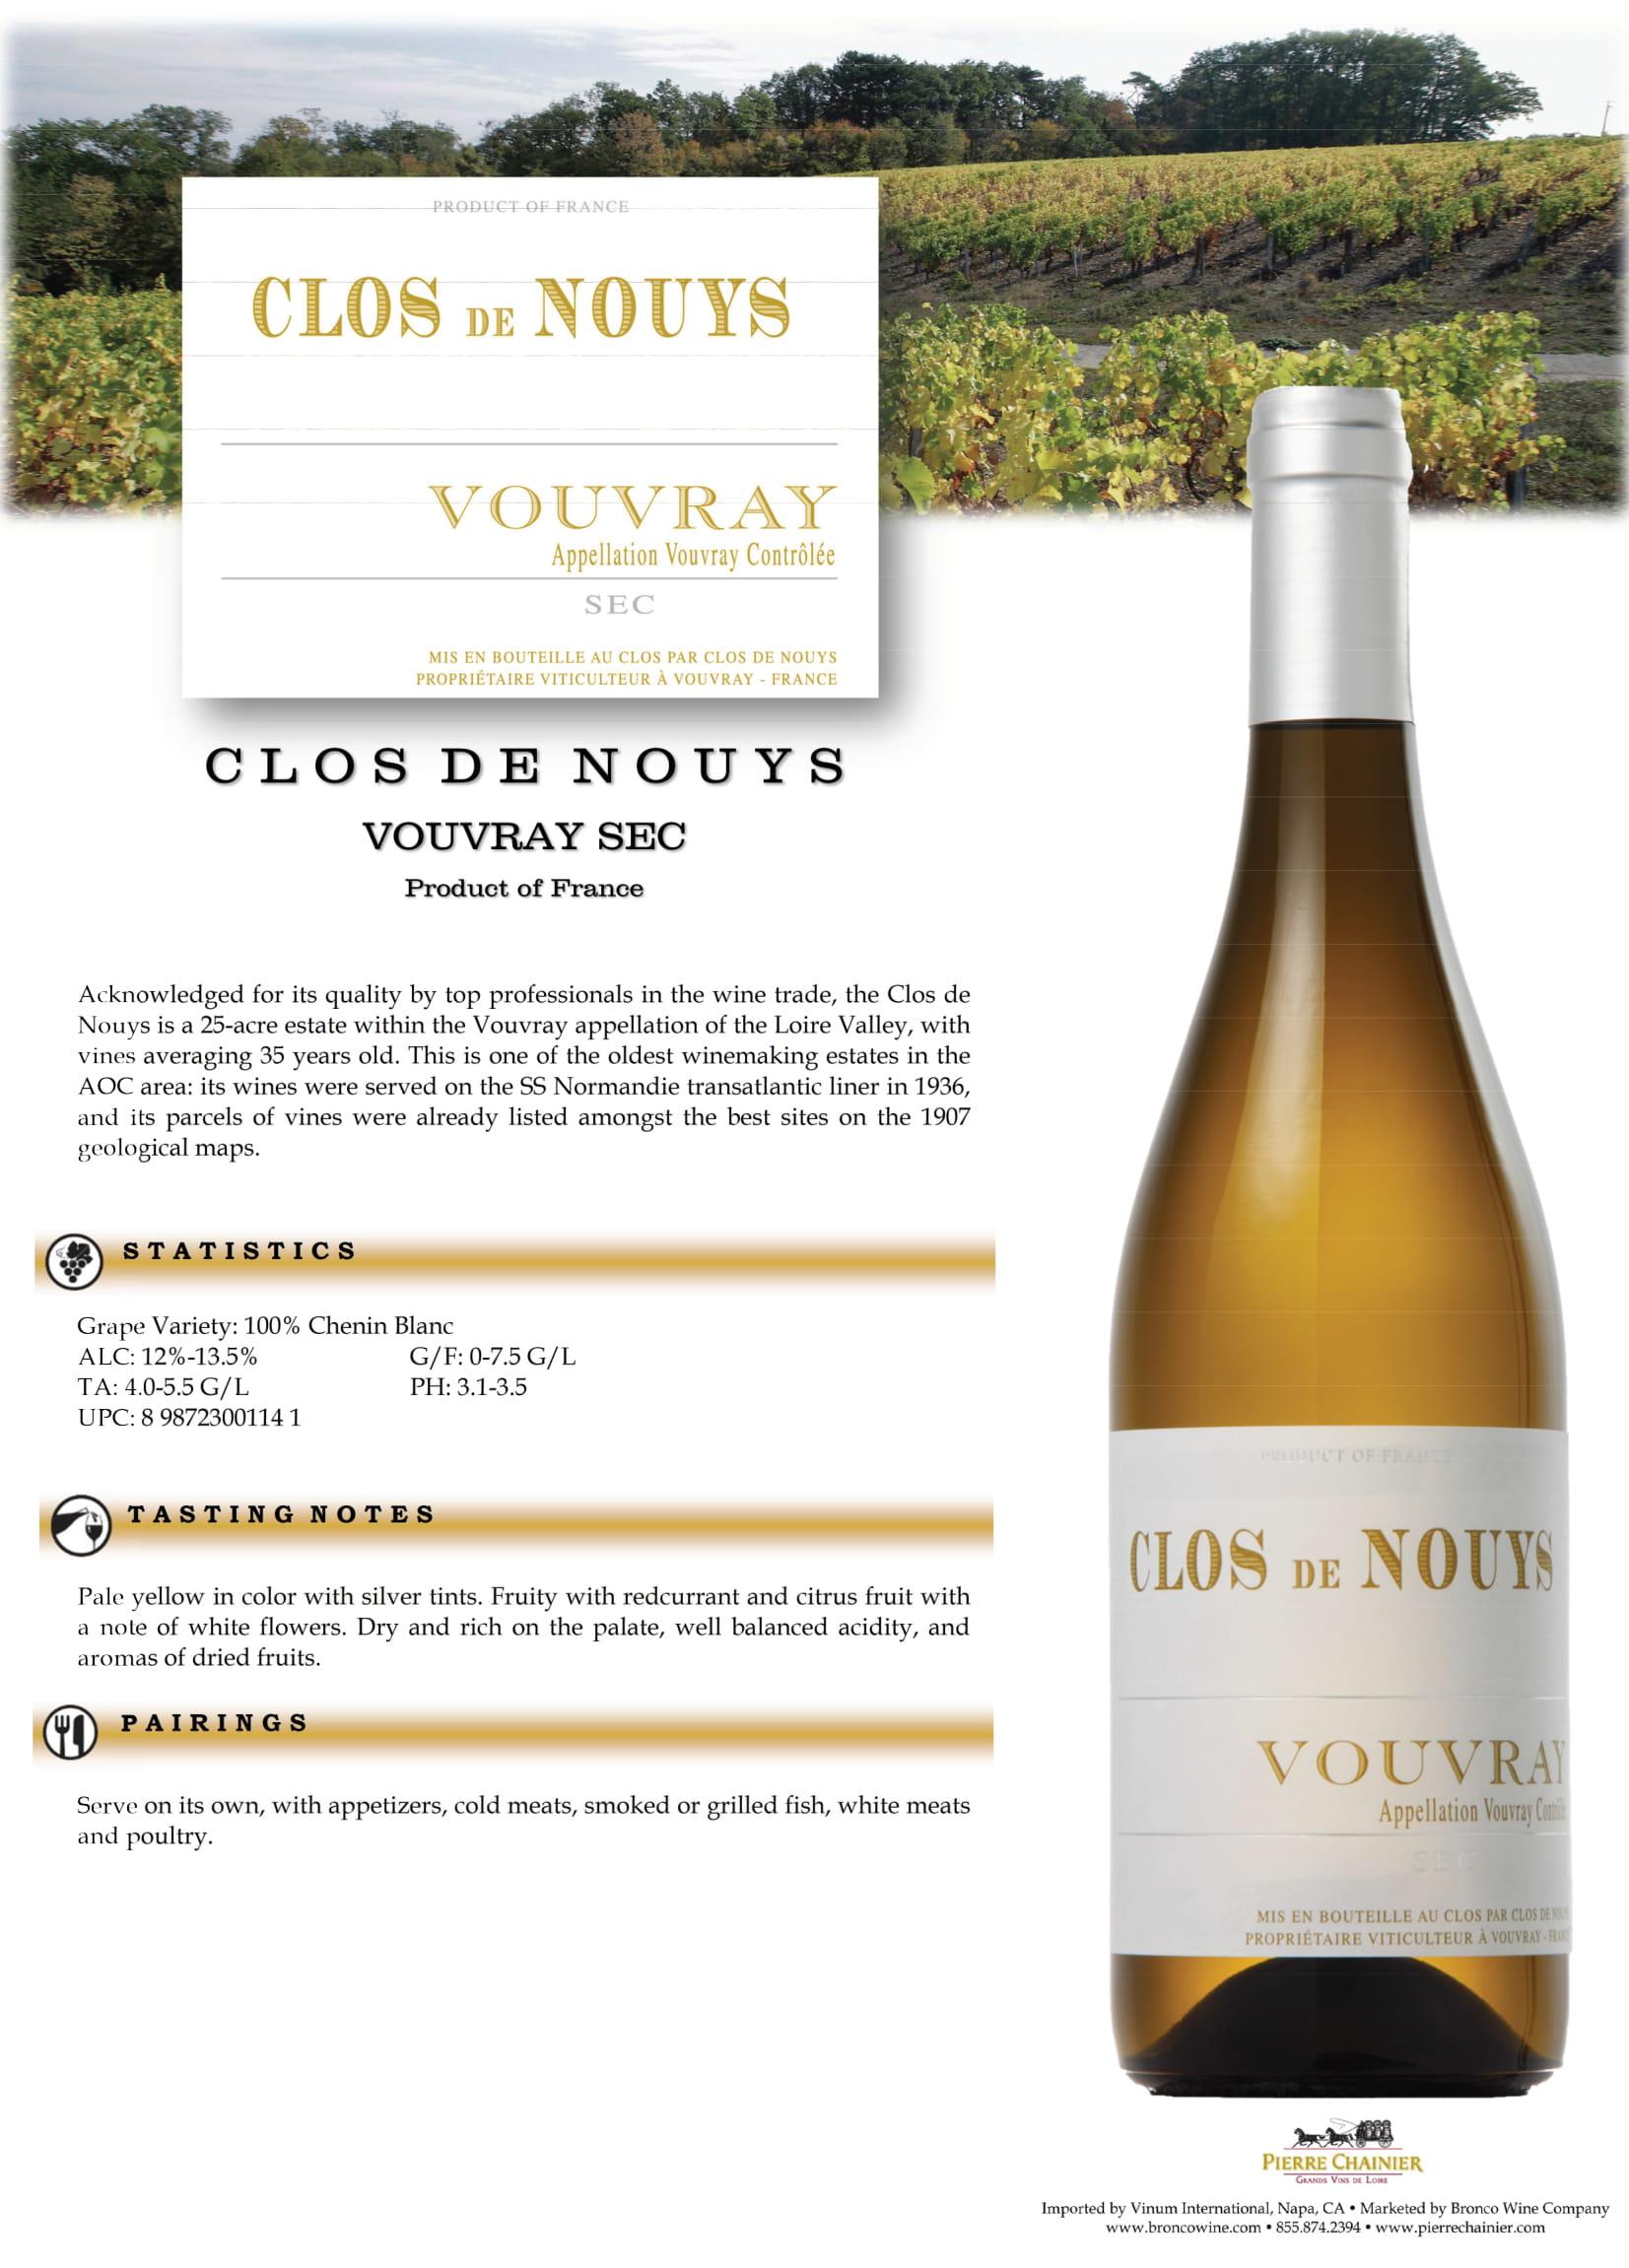 Clos de Nouys Vouvray Sec Tech Sheet